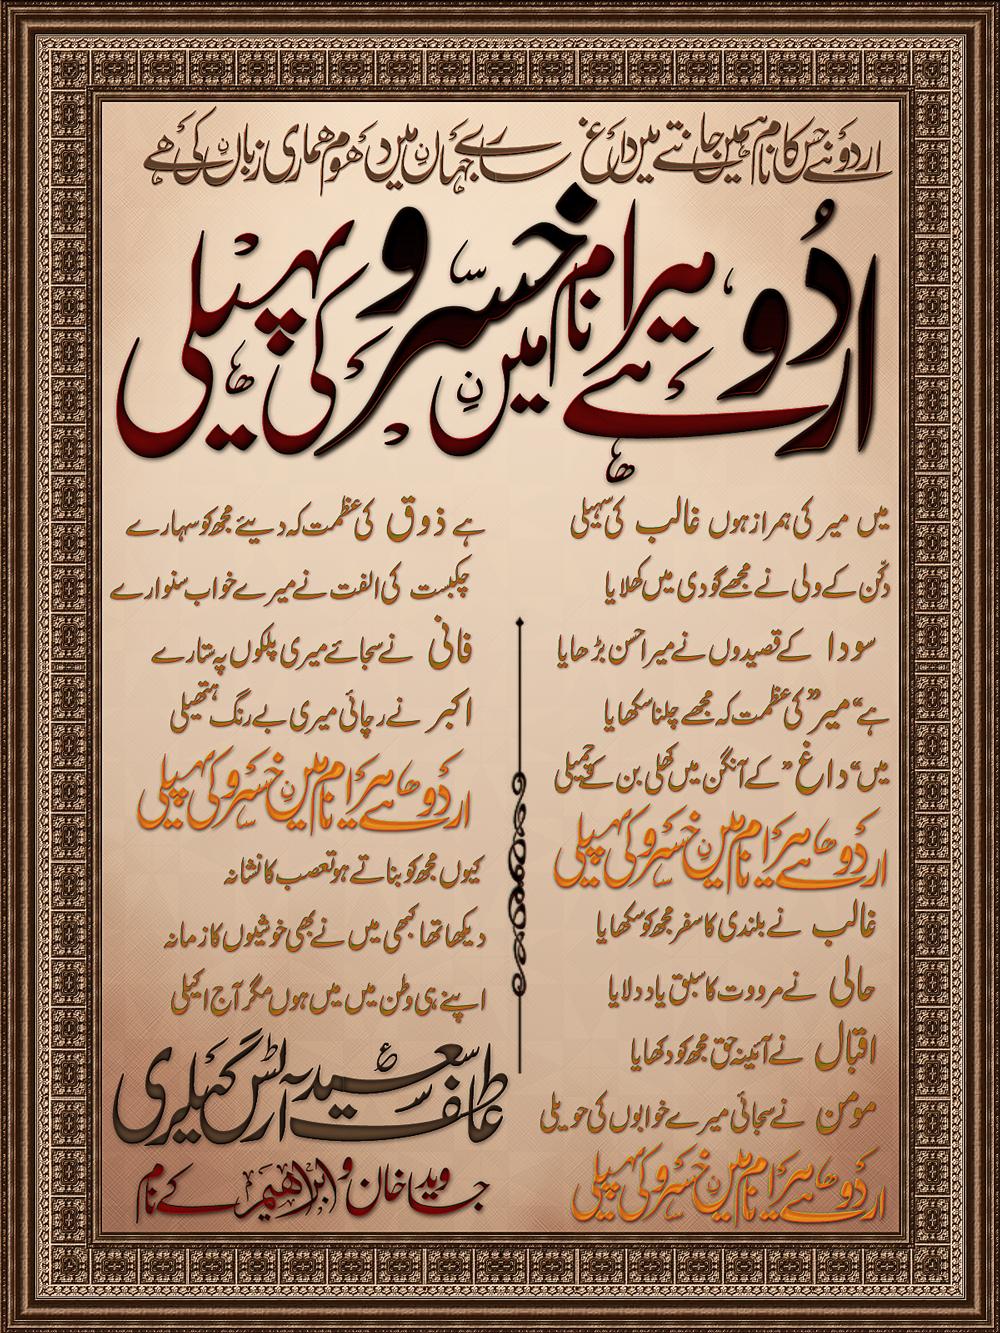 Urdu Hai Mera Naam by atifsaeedicmap on DeviantArt